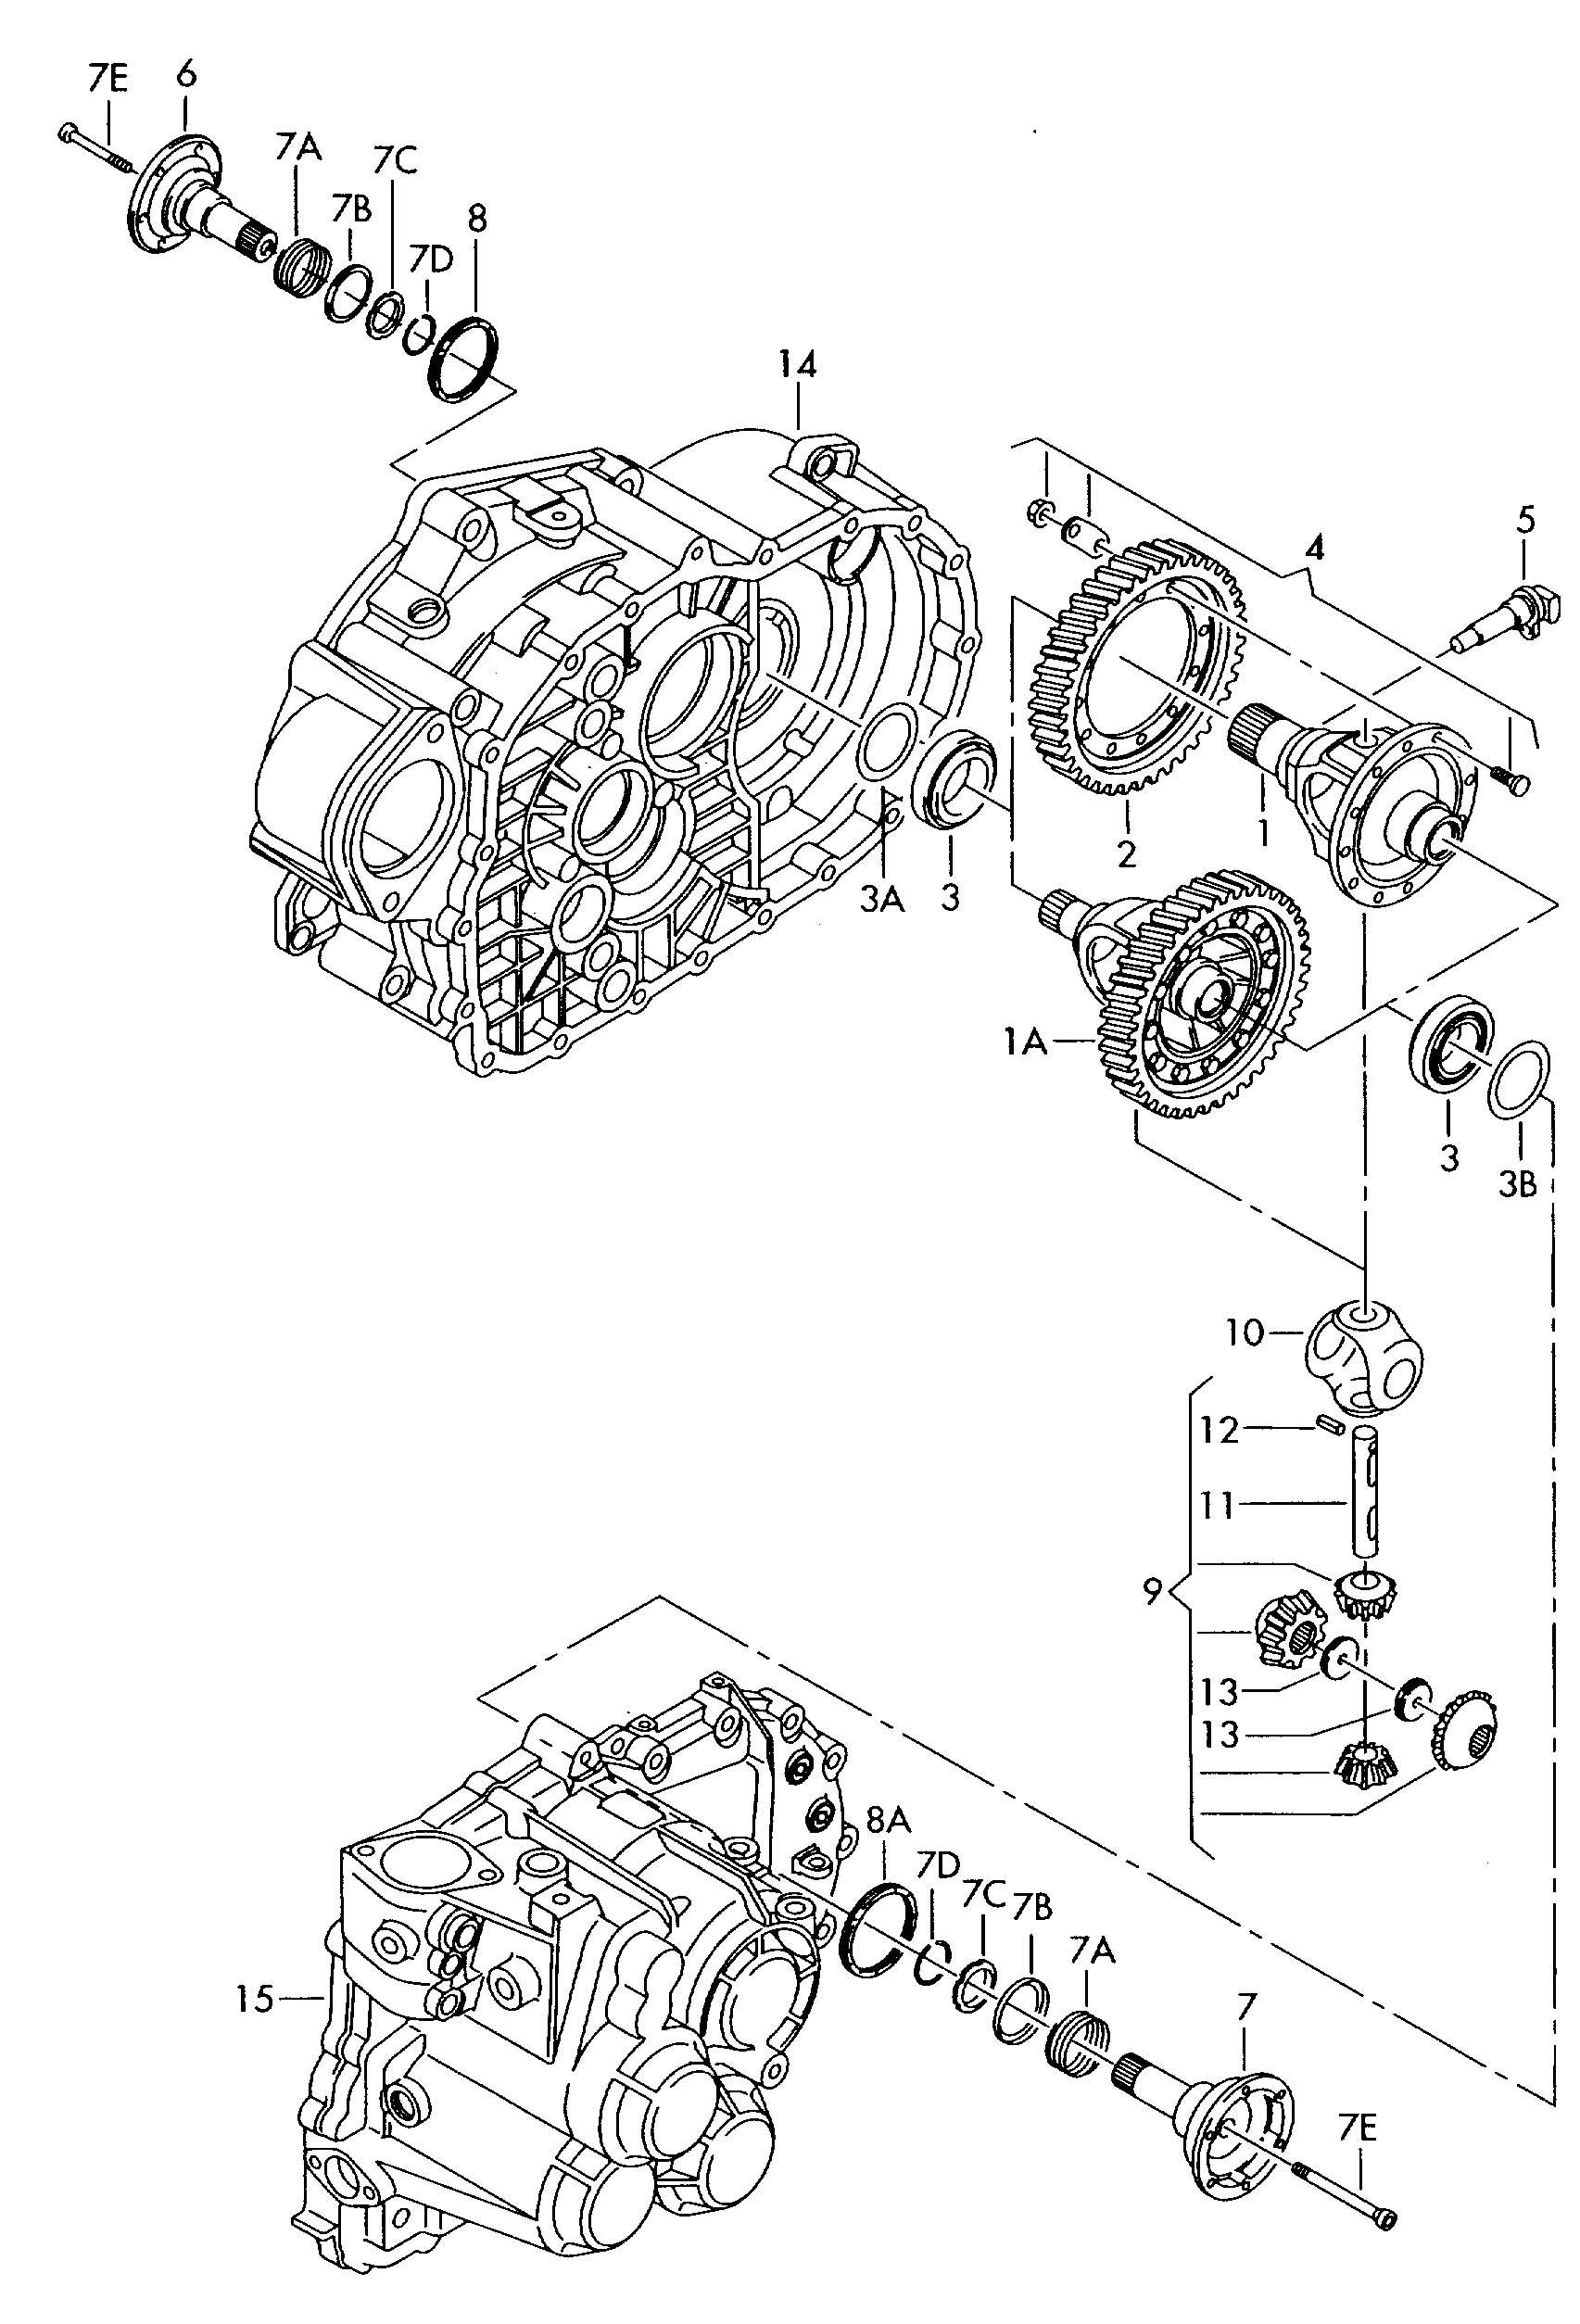 2000 Saturn Manual Transmission Parts Diagram, 2000, Free